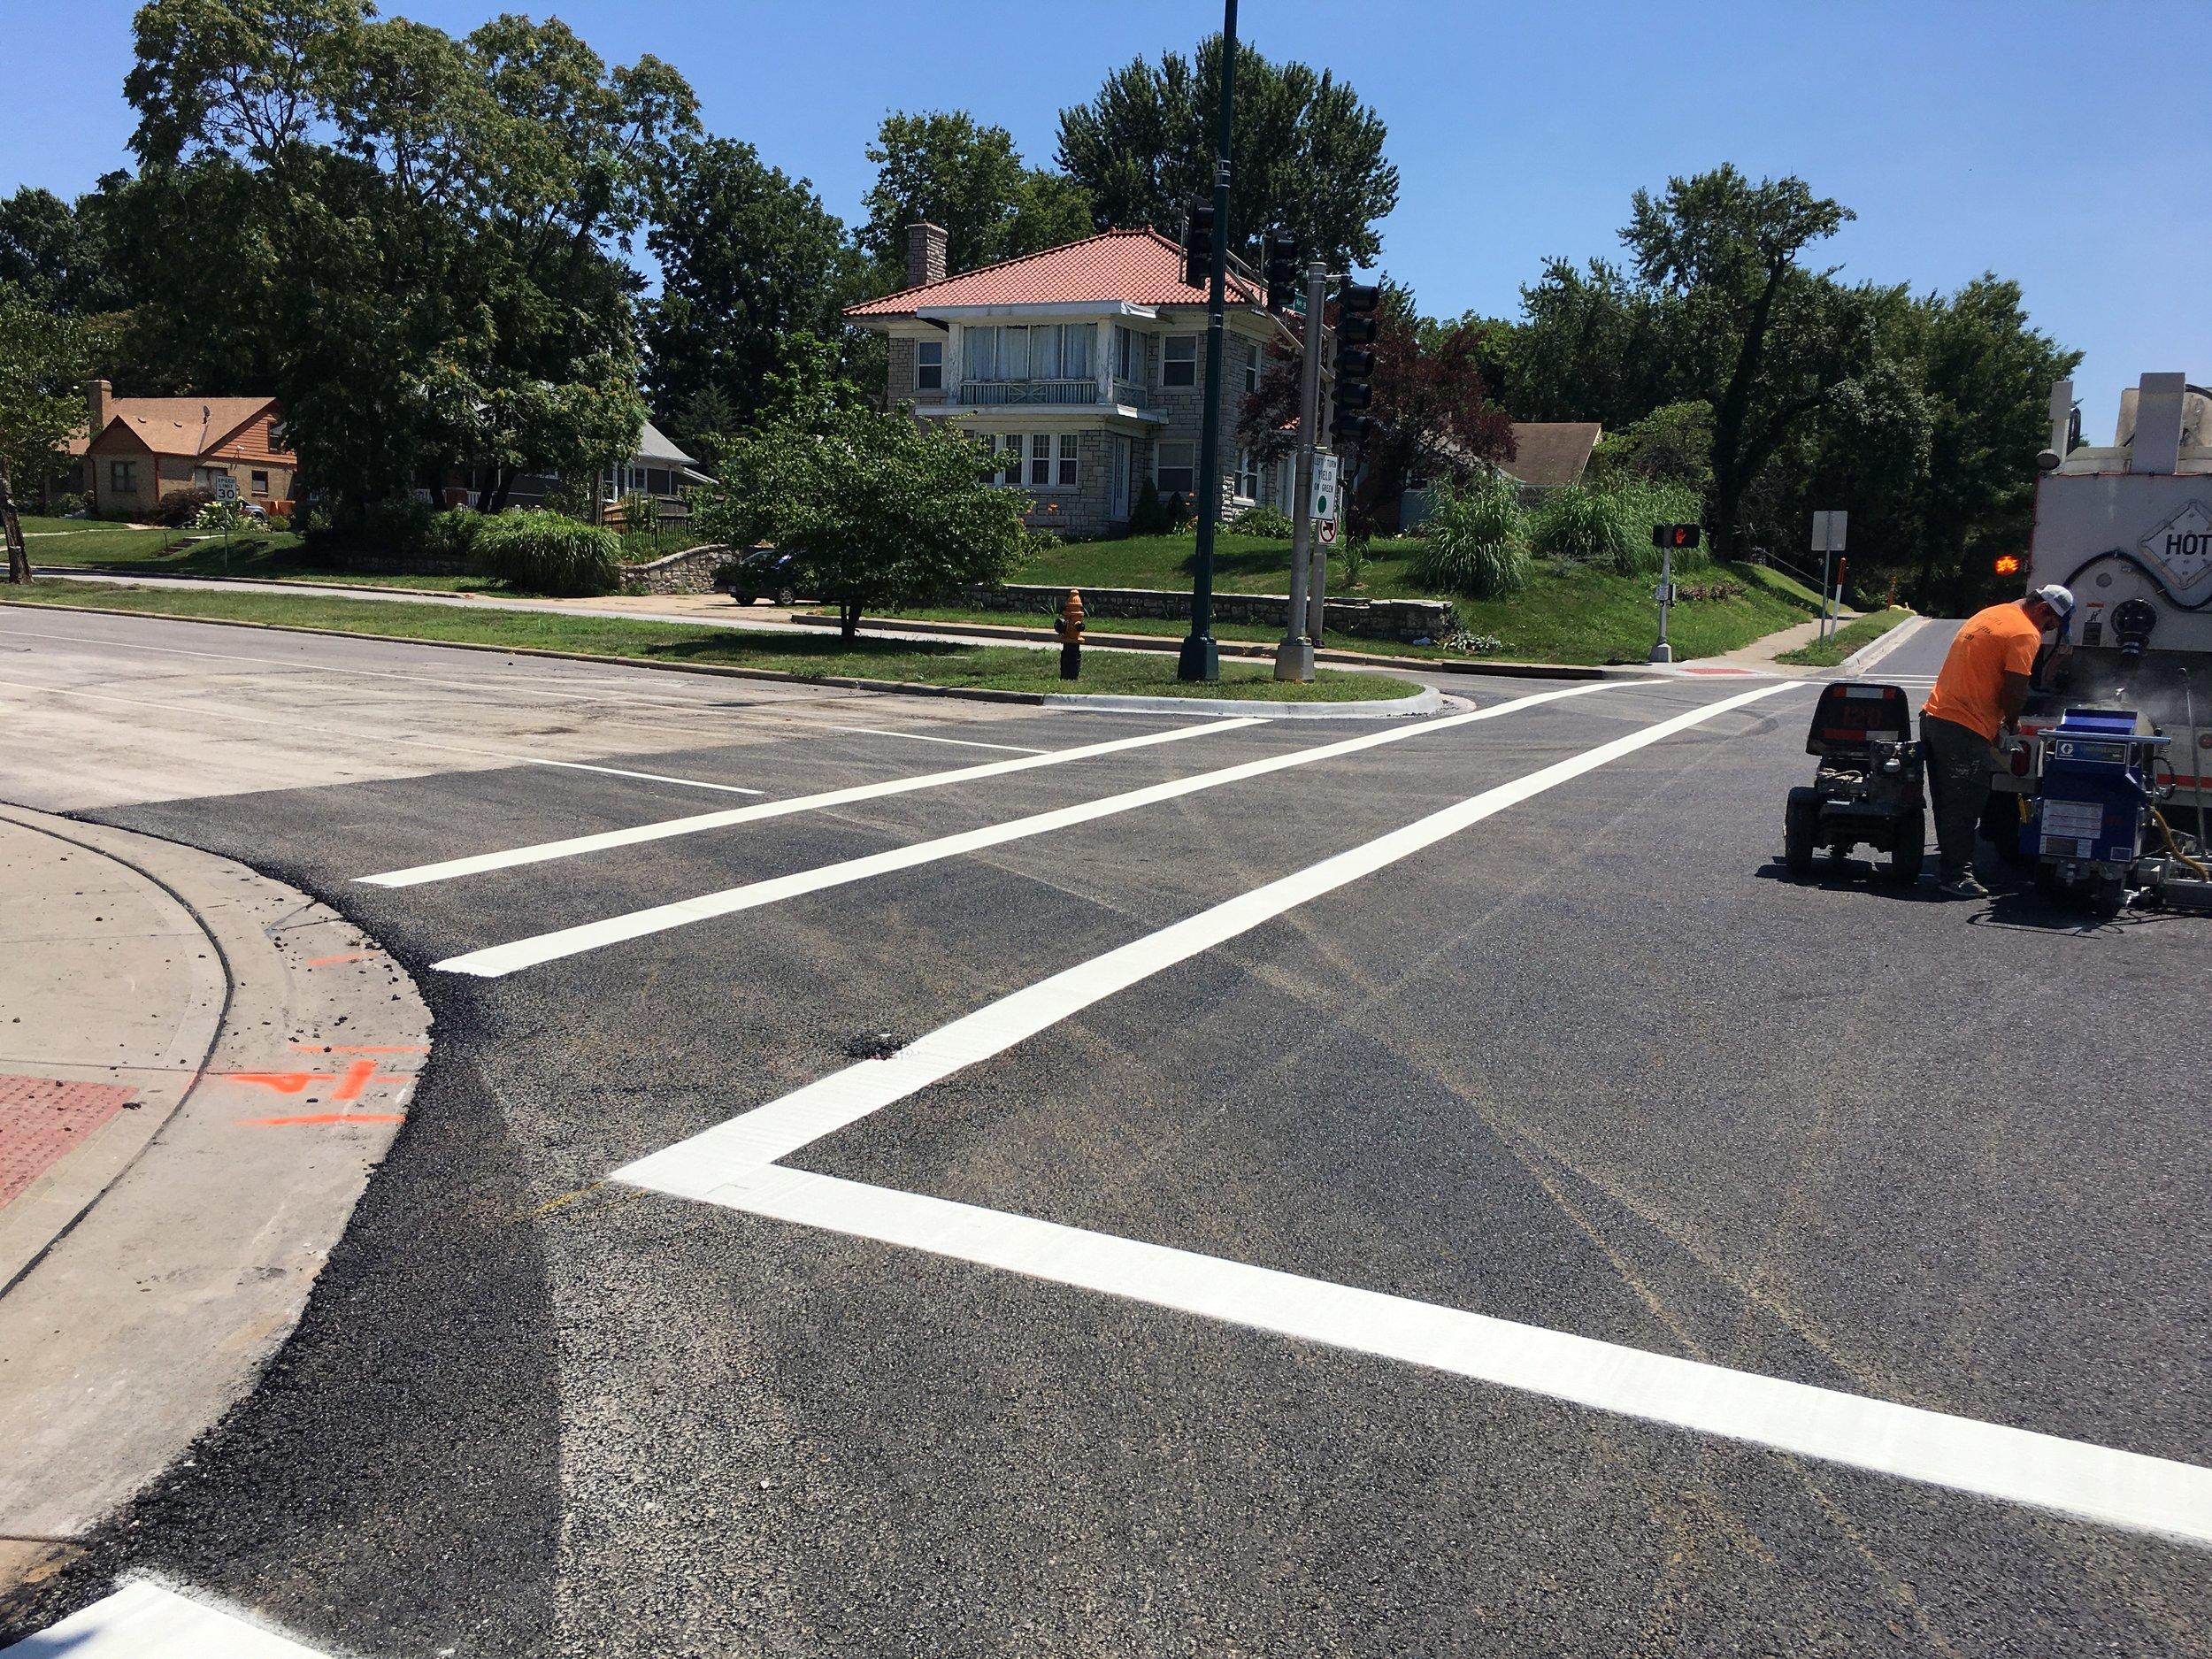 roadway-marking-and-striping.jpg